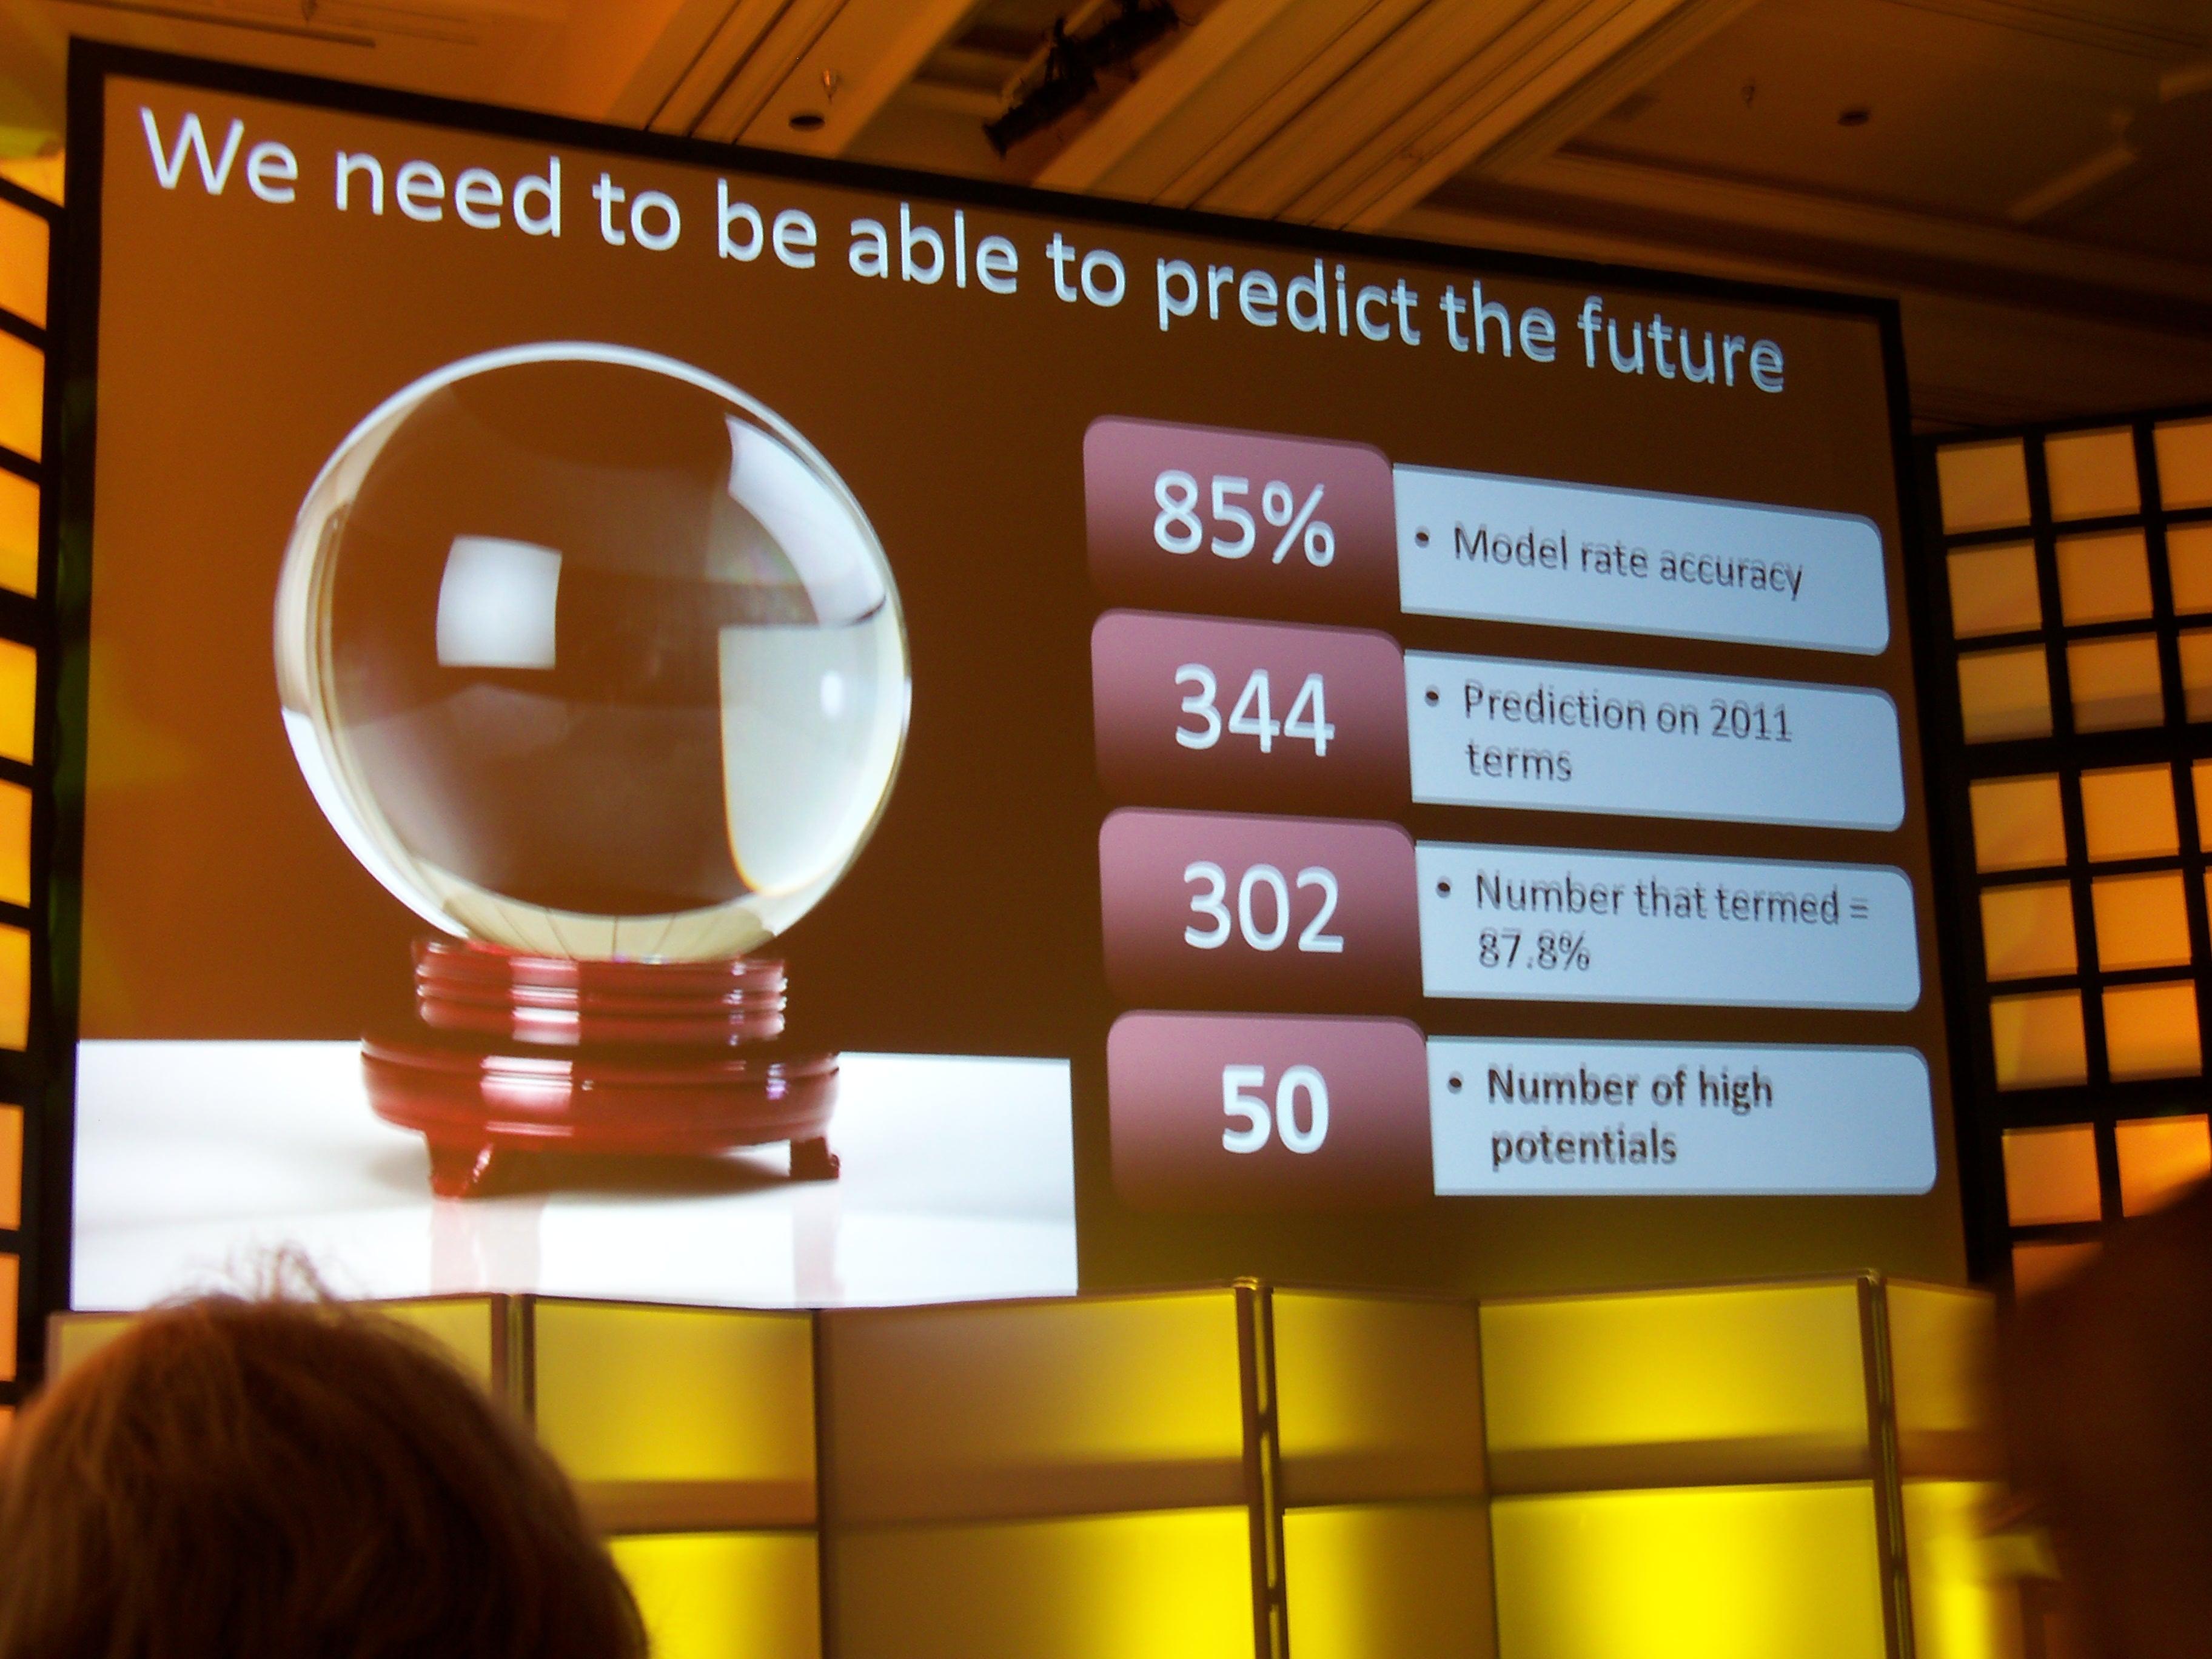 Ultimate Software Predictive Analytics - Copyright 2012 TechVentive, Inc.